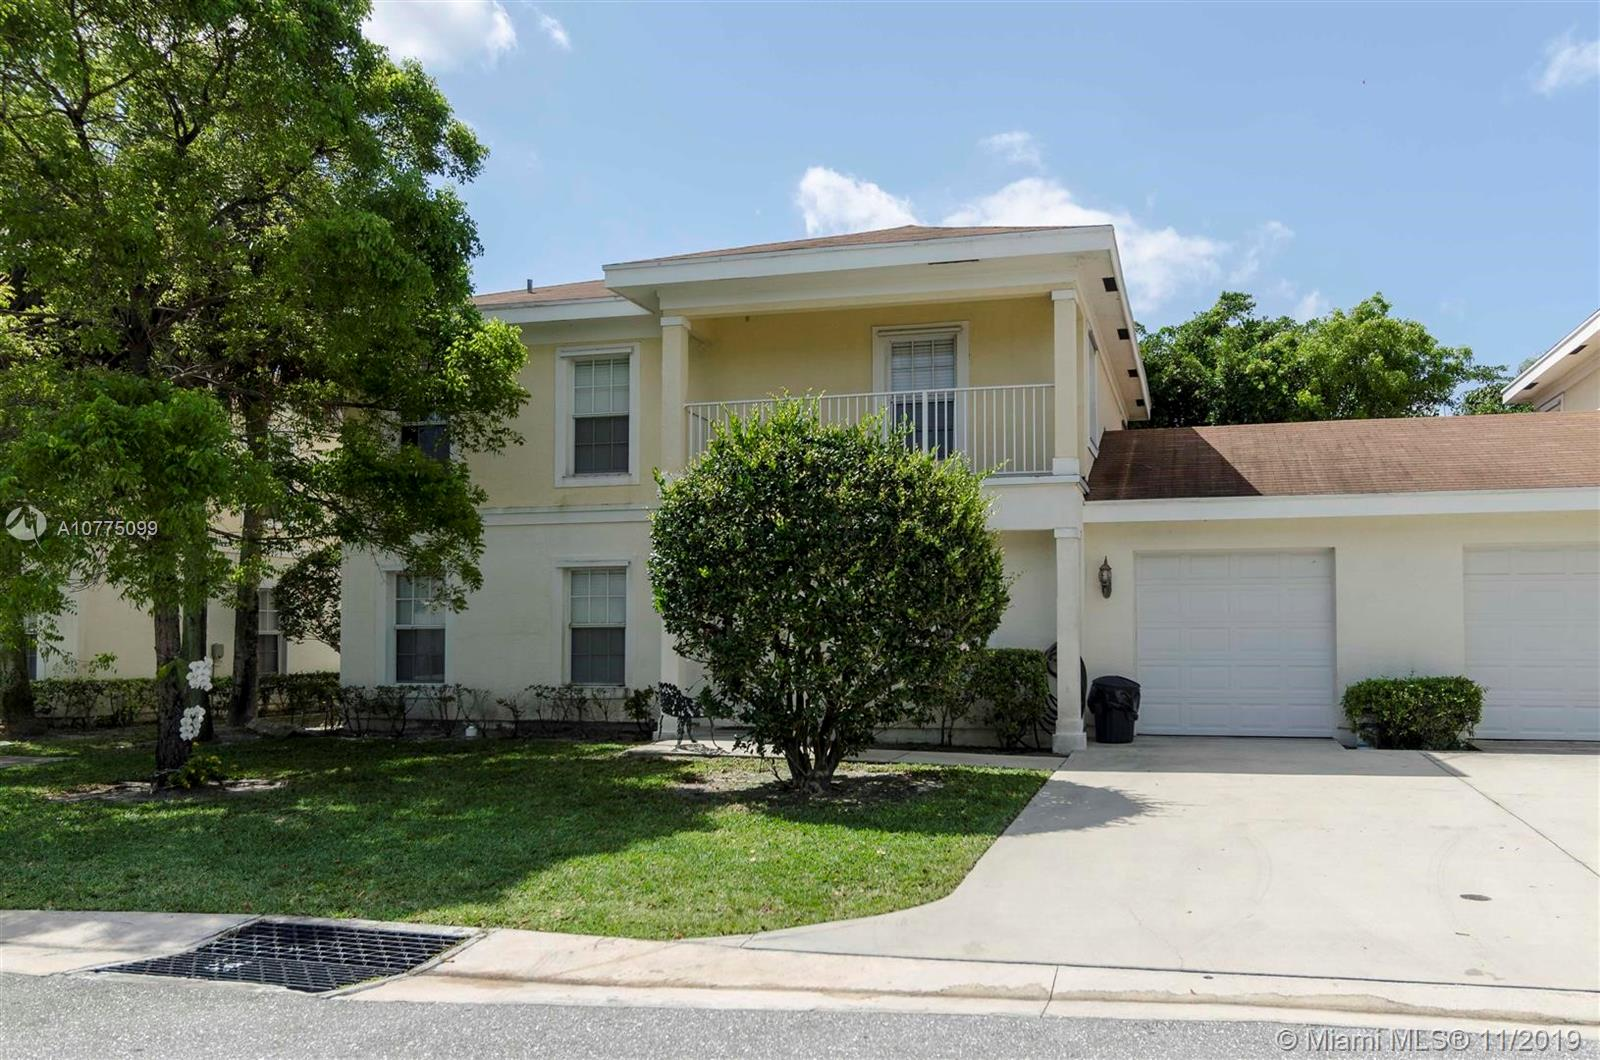 3813 DOVE LANDING R DOVE LANDING RD, West Palm Beach, FL 33403